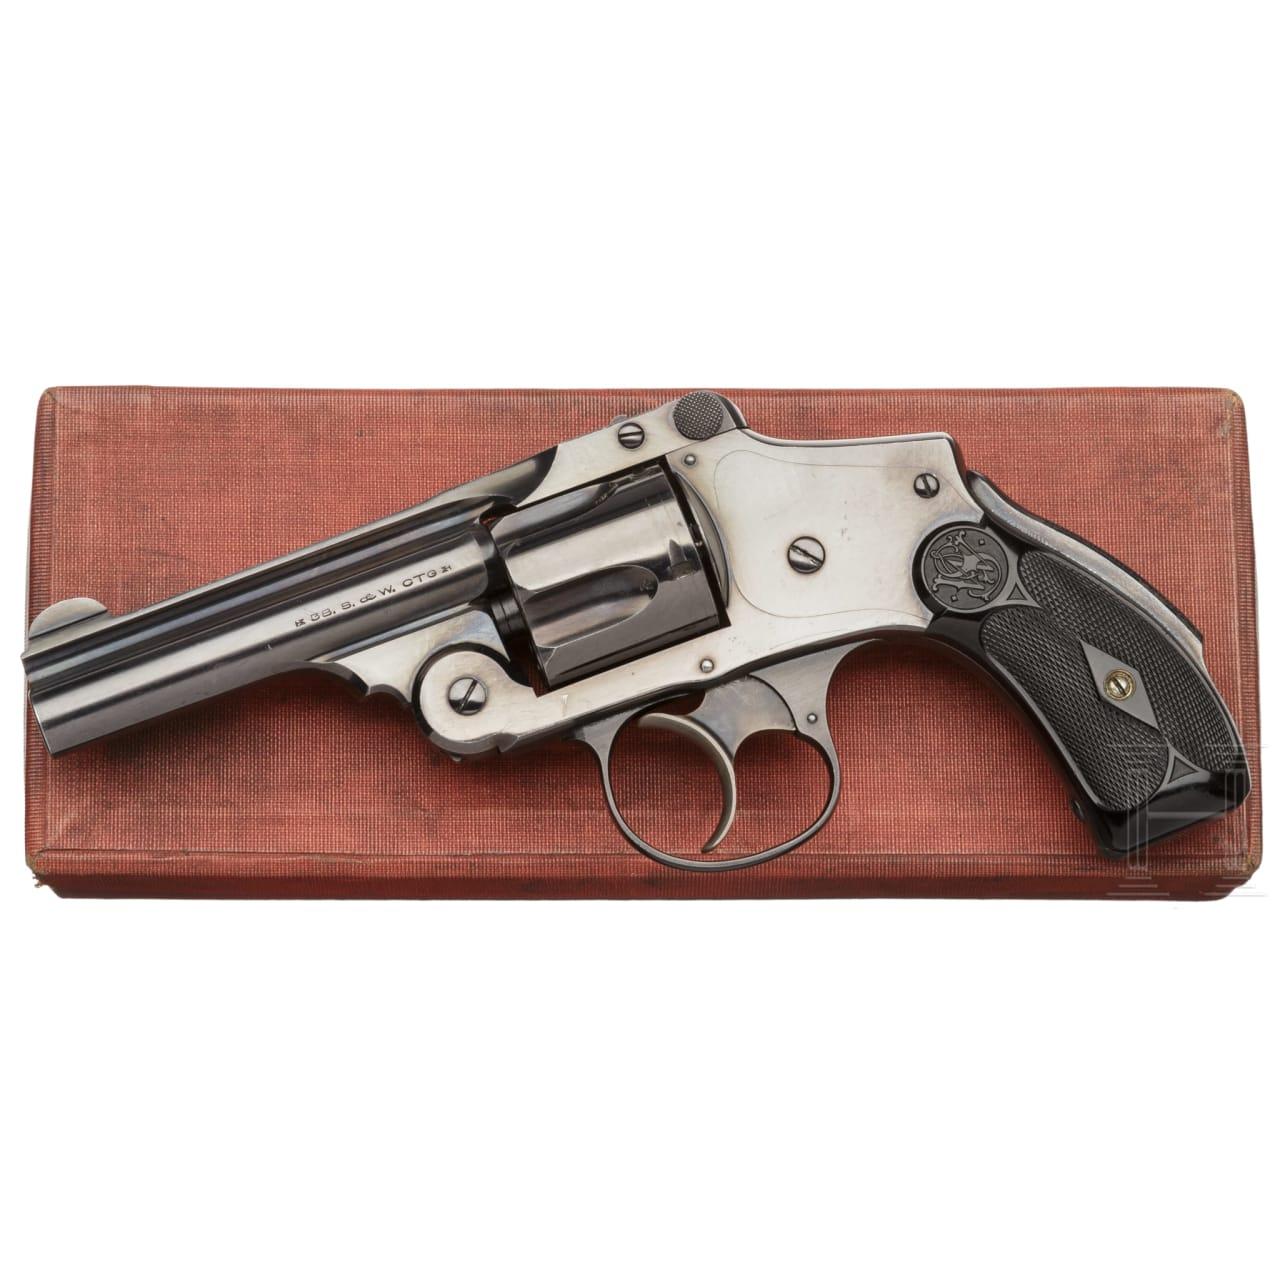 Smith & Wesson .38 Safety Hammerless 5th Model, im Karton